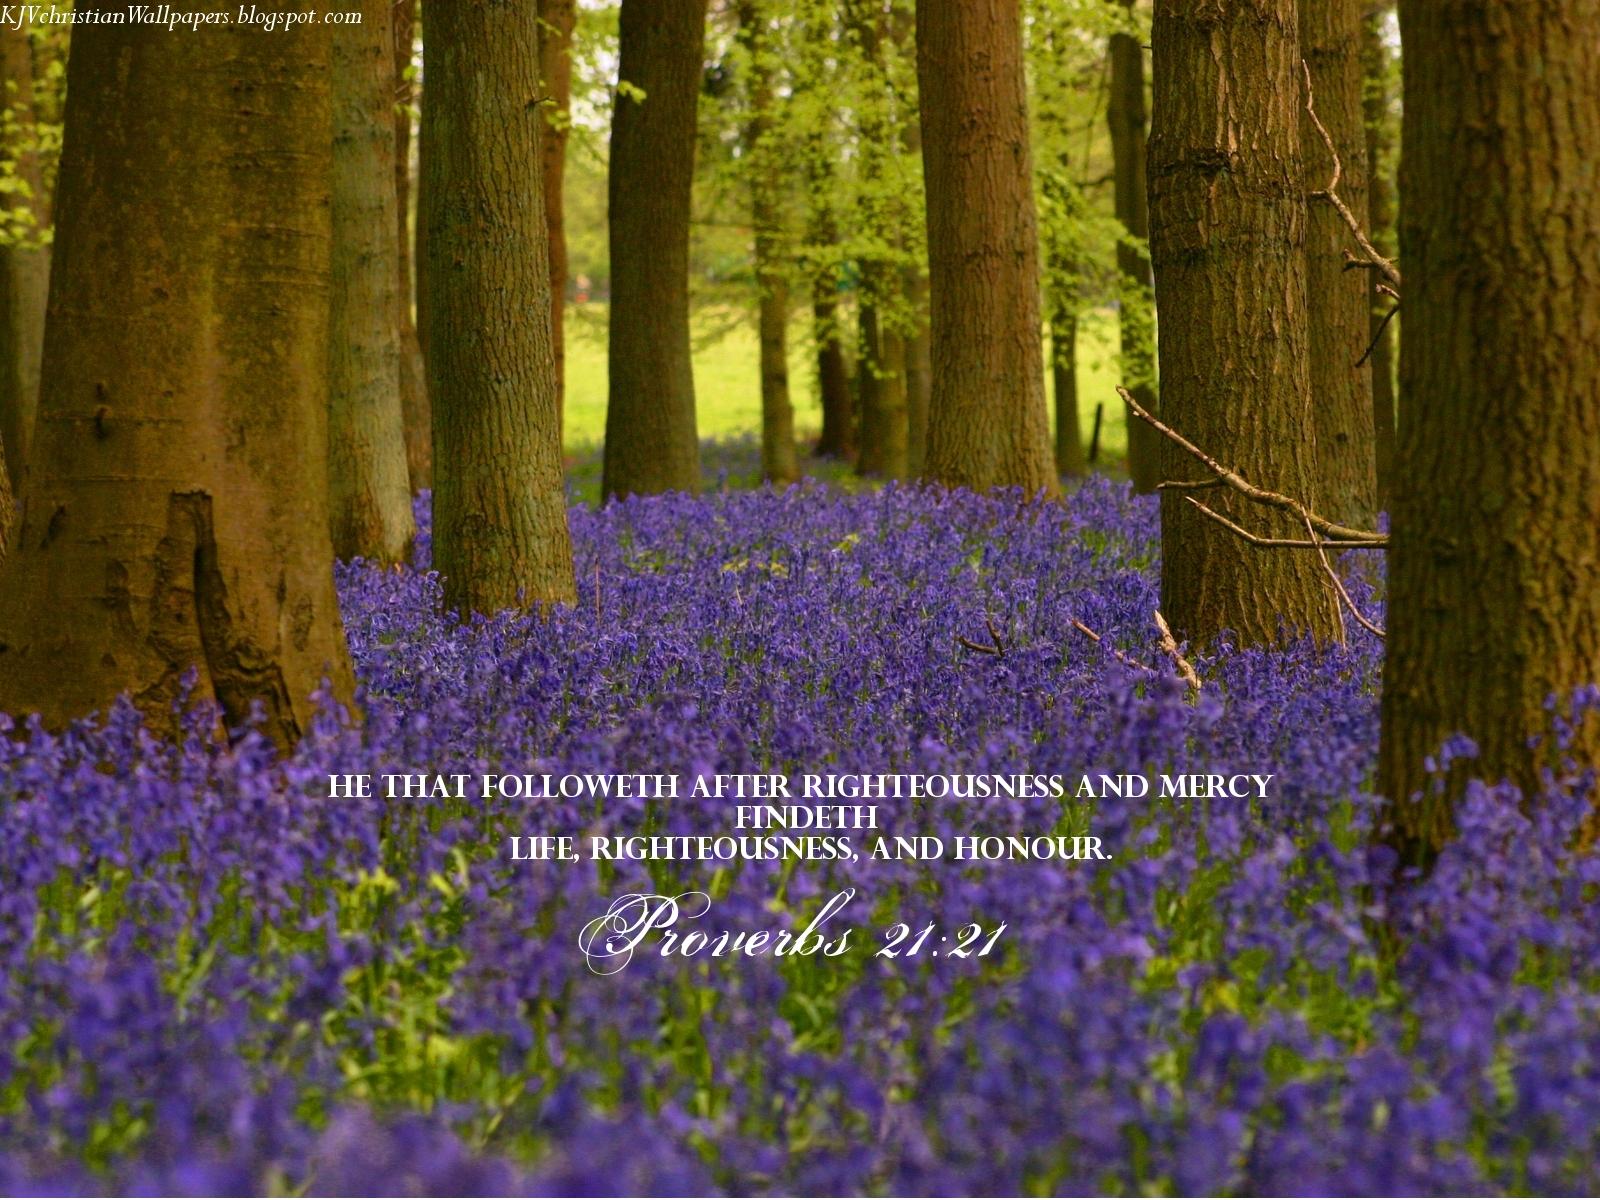 King James KJB versed Christian Wallpaper Proverbs 2121 1600x1200